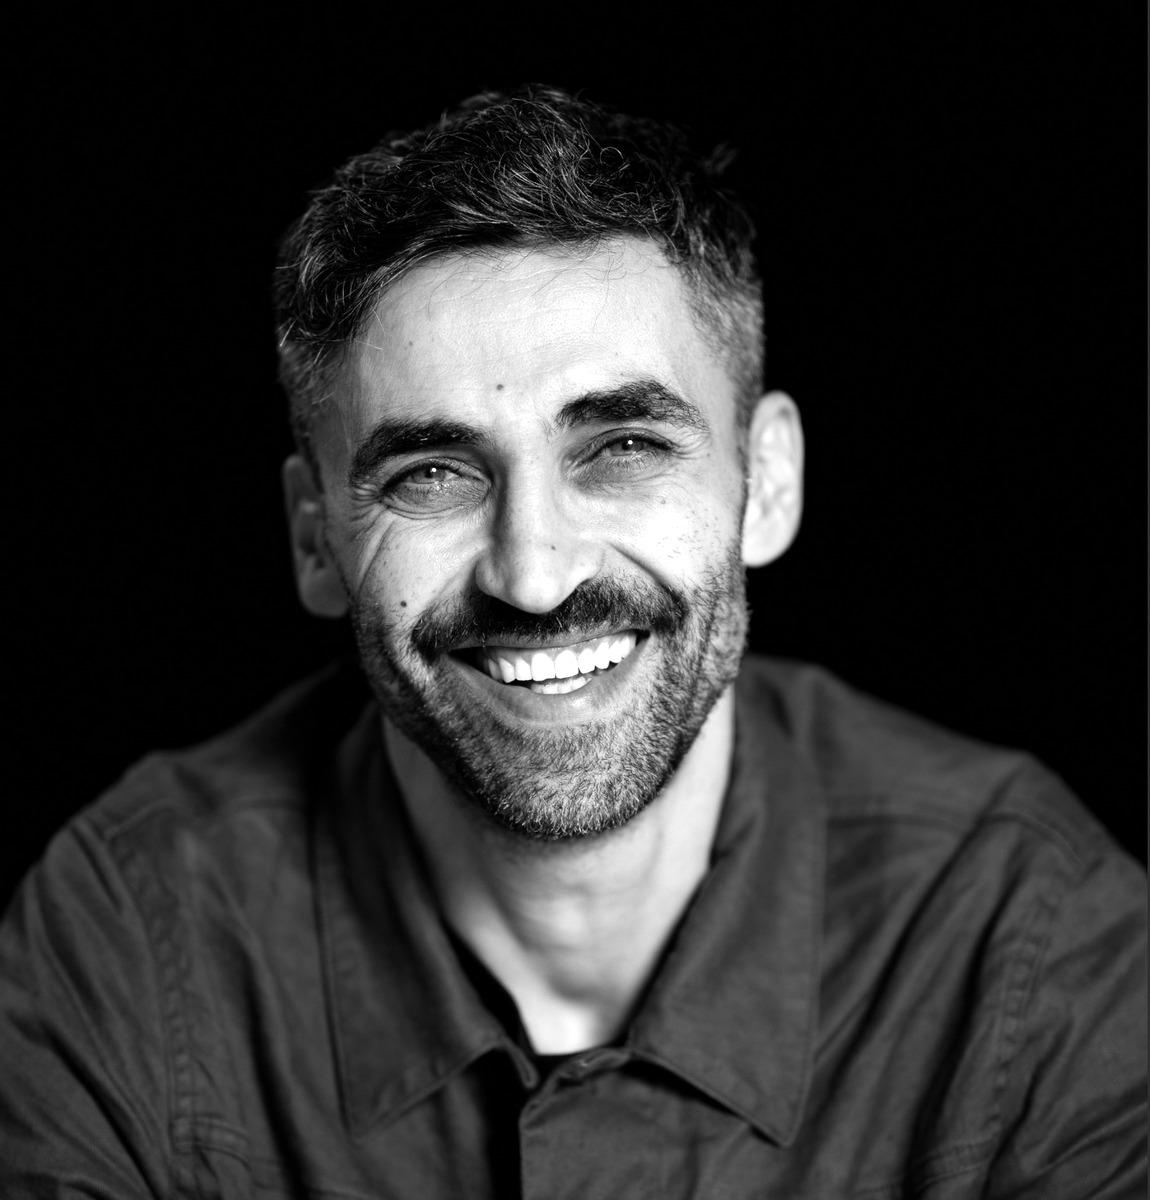 021 Yousef Hammoudah: How we built adidas Runners